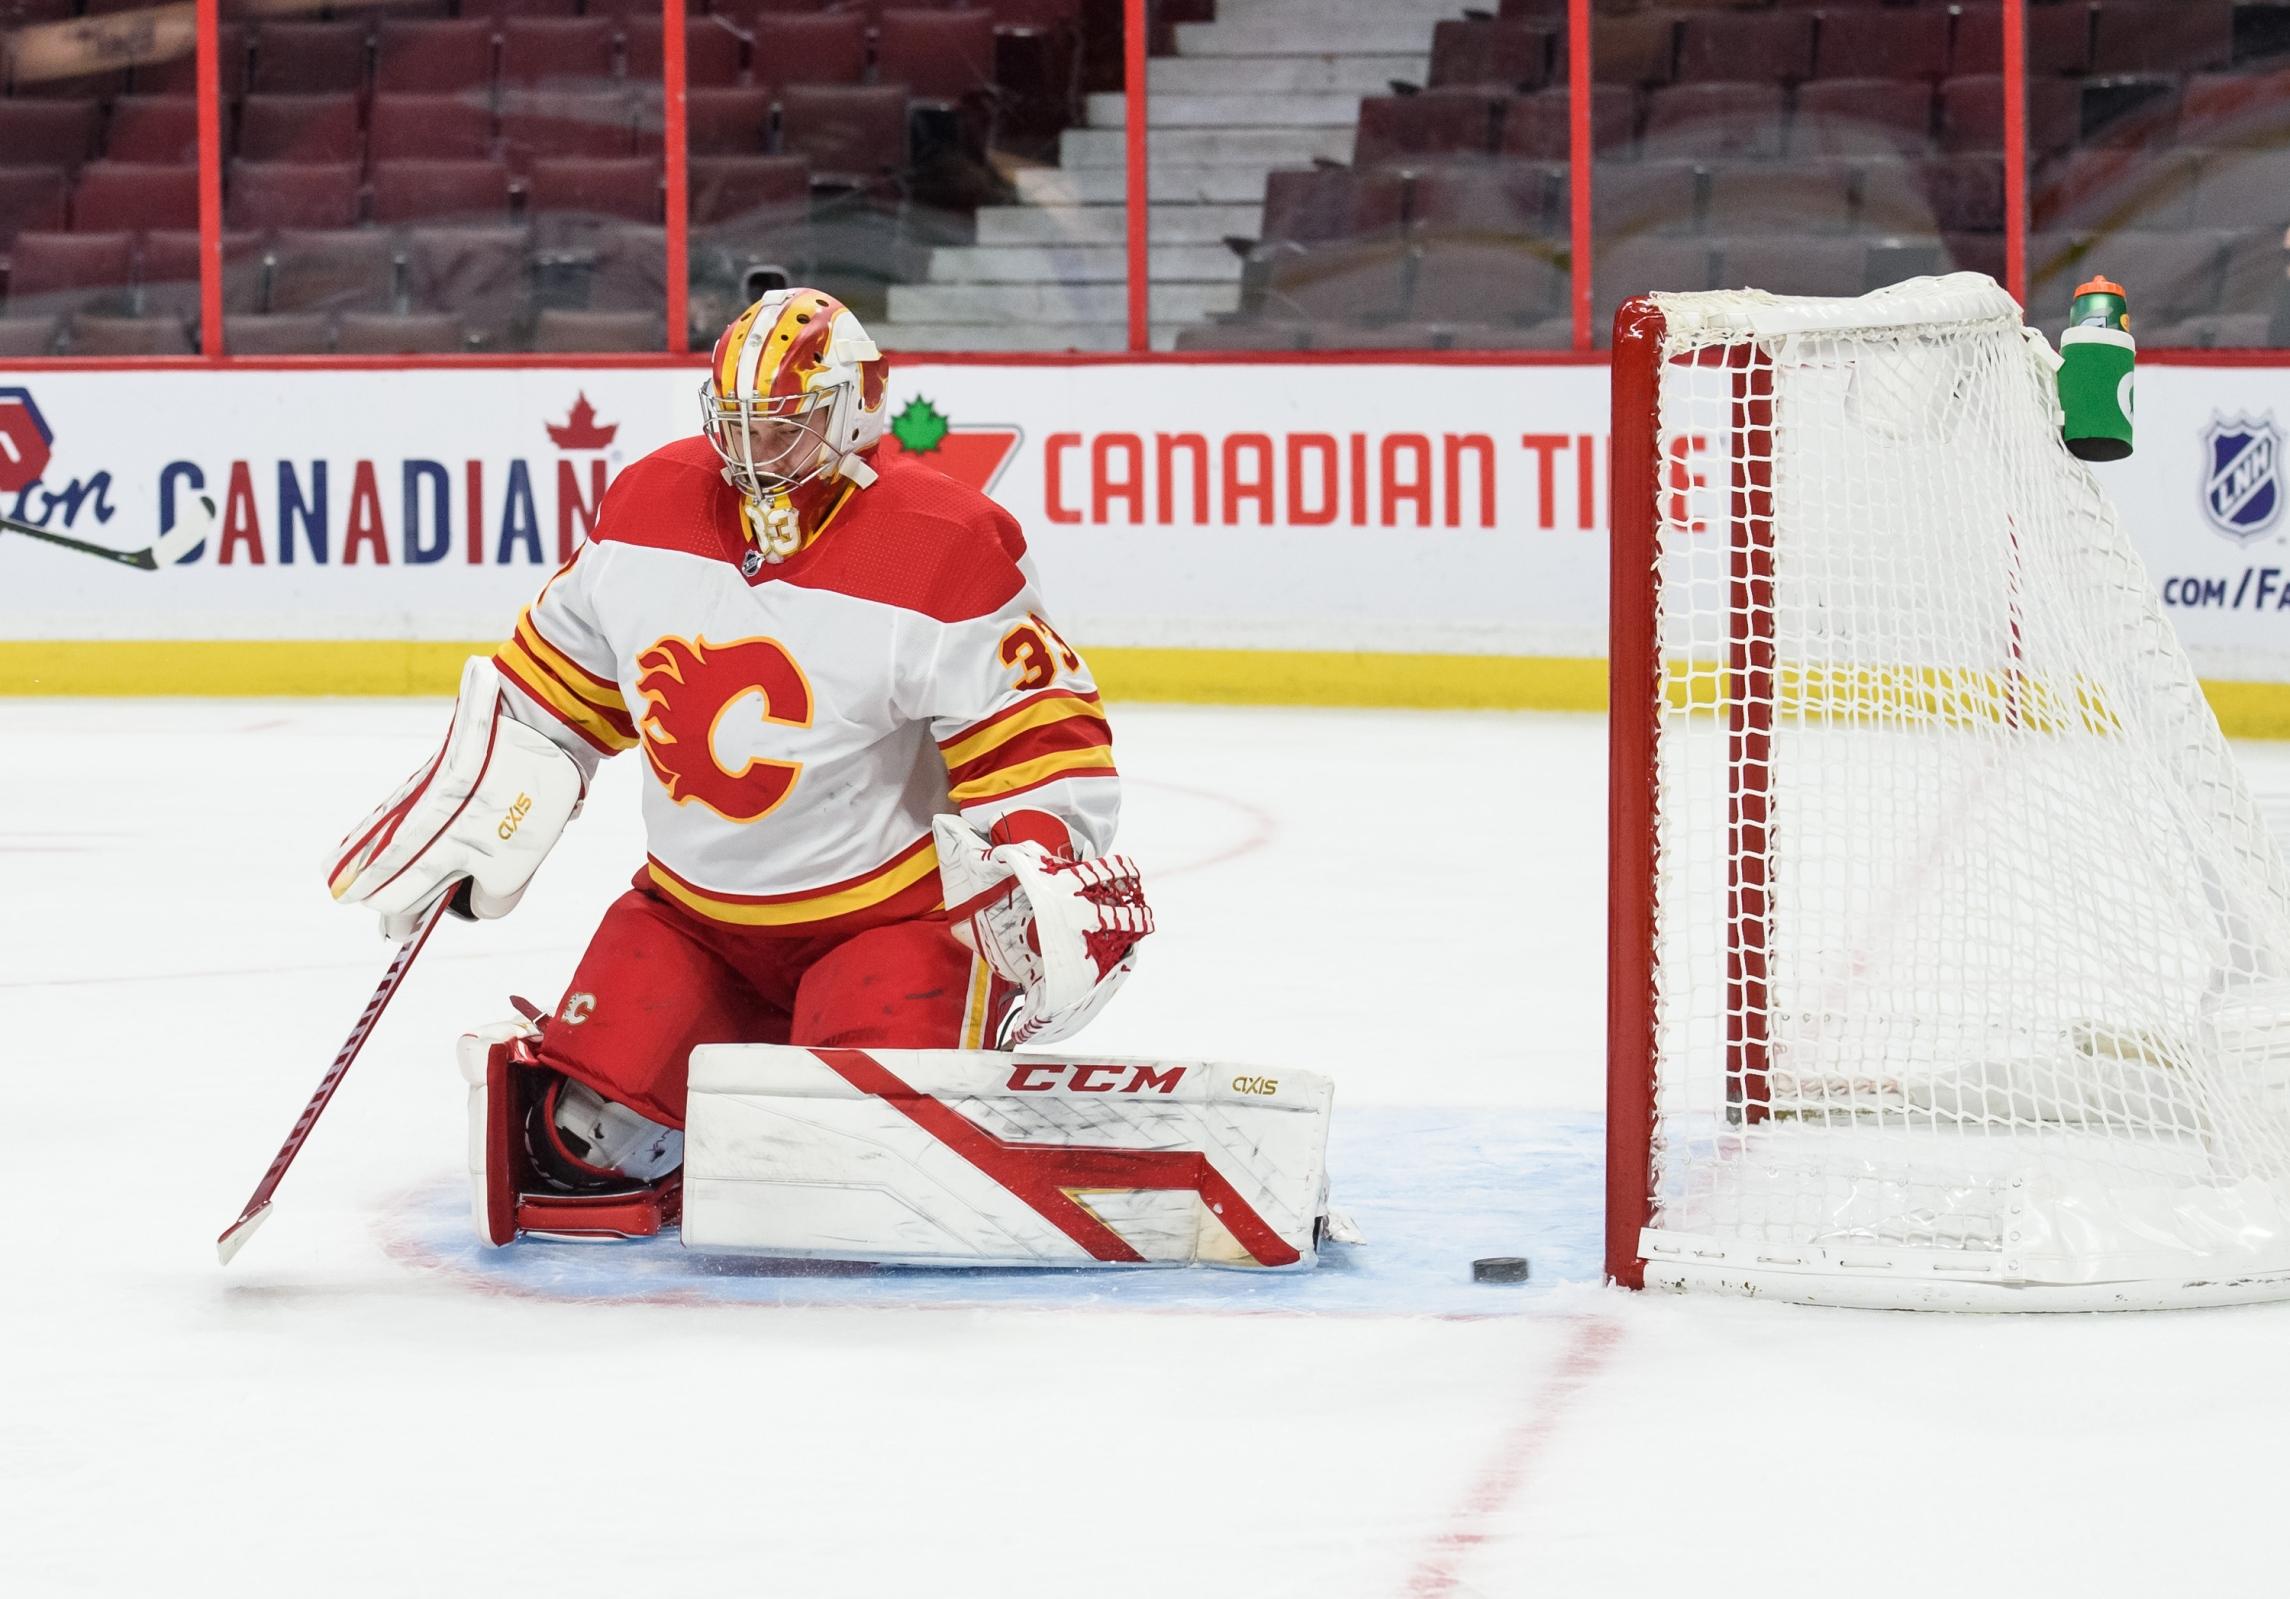 David Rittich of the Calgary Flames allows a goal